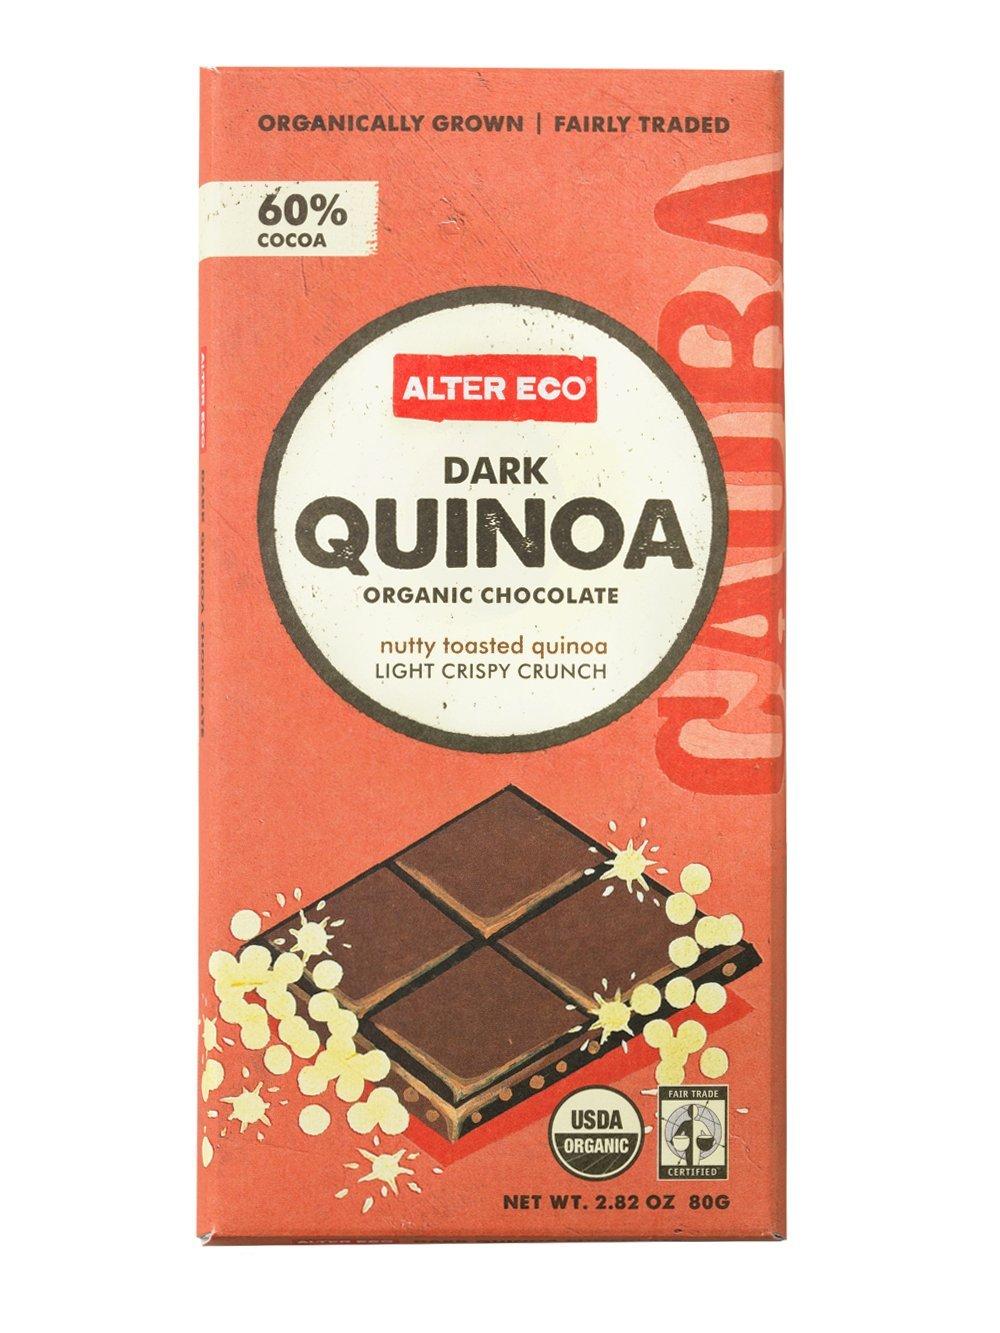 Amazon.com : Alter Eco - Dark Quinoa Organic Chocolate - 2.82 oz ...